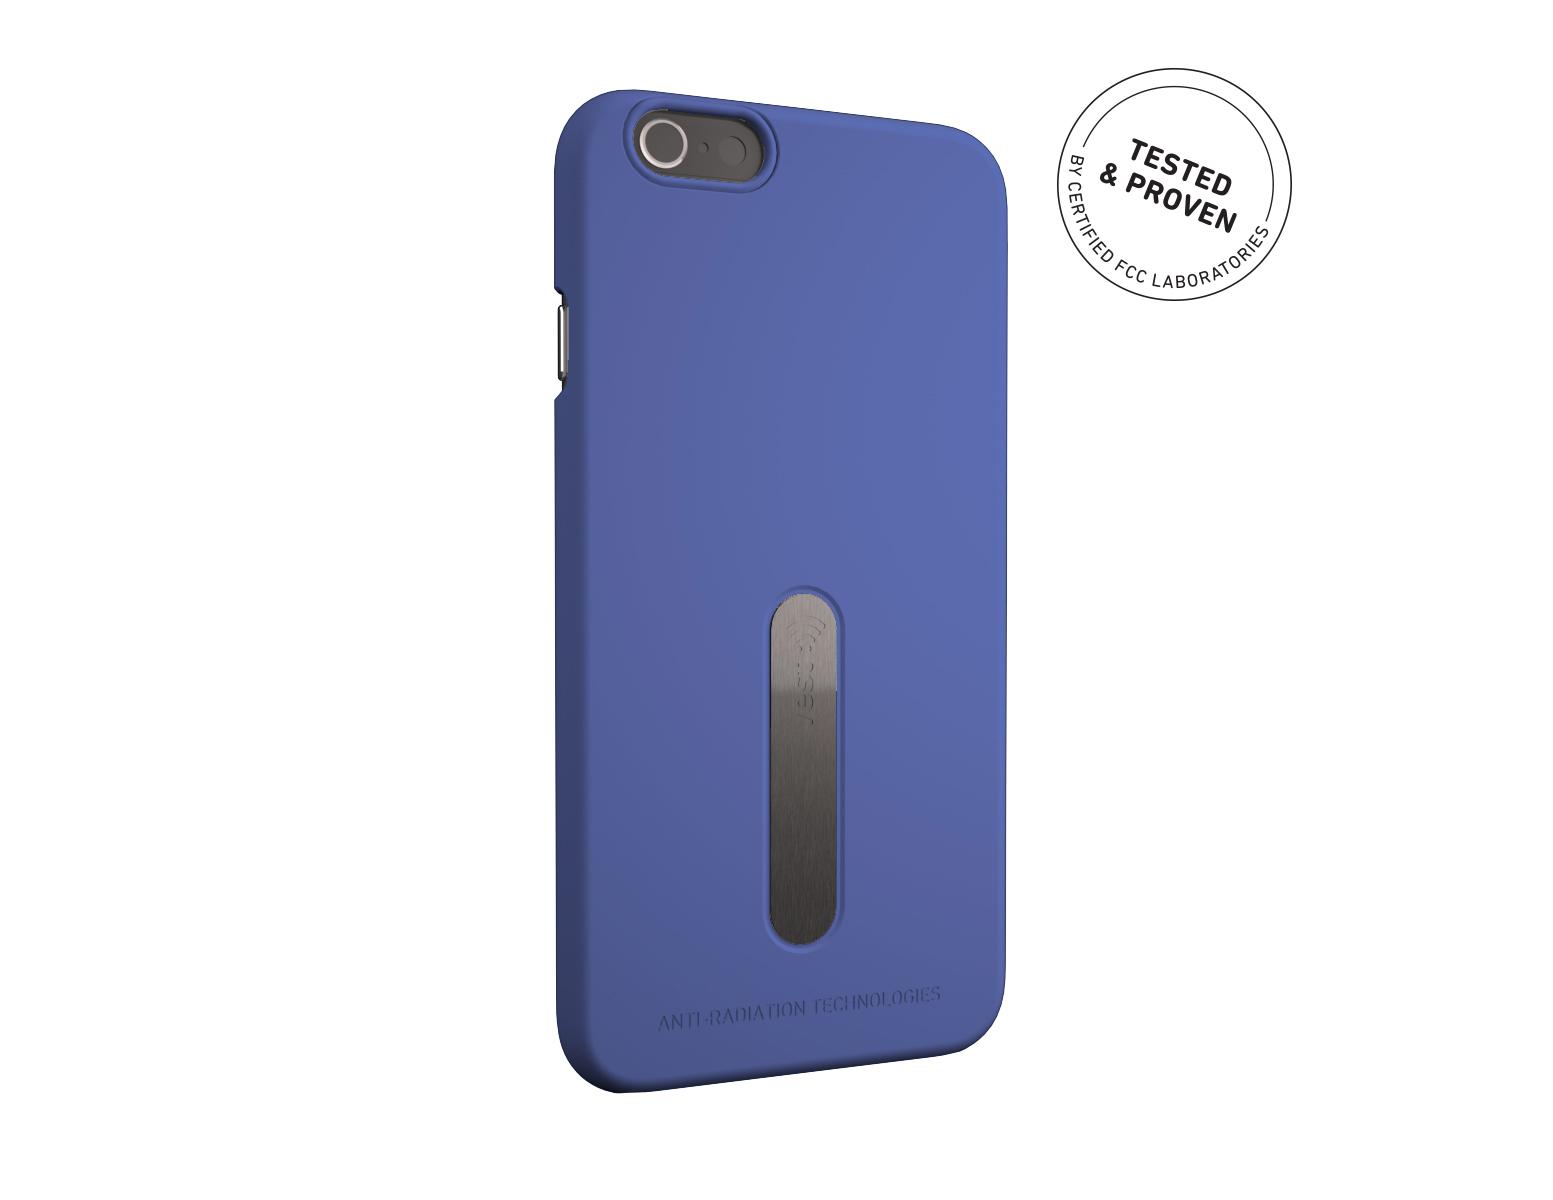 huge discount 44284 9fca4 Vest Anti Radiation Phone Case w/ Bonus screen cover